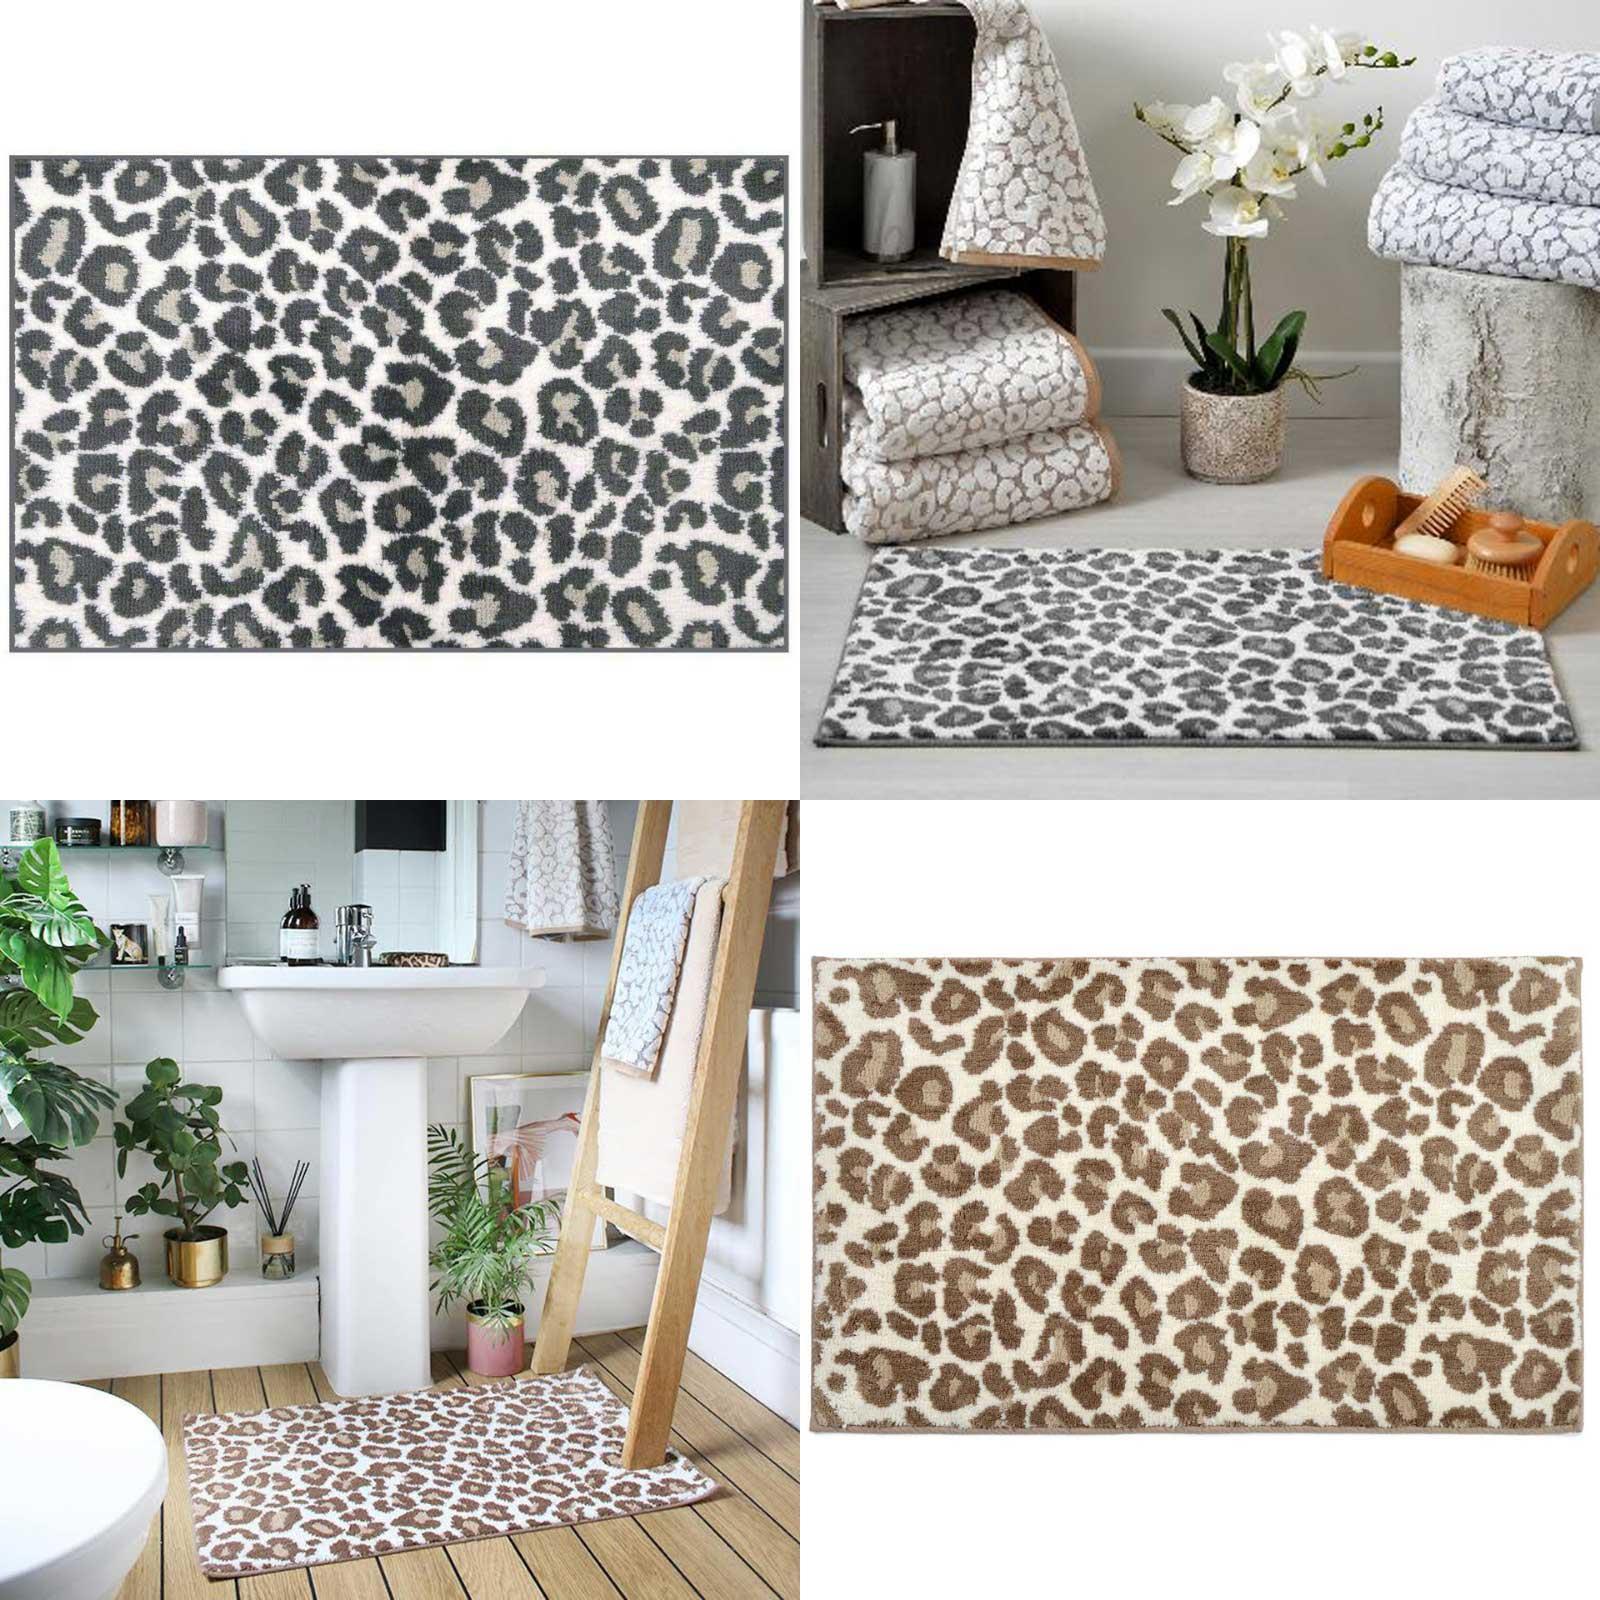 Picture of: Leopard Print Bath Mat Non Slip Super Soft Absorbent Animal Bathroom Shower Mats Ebay